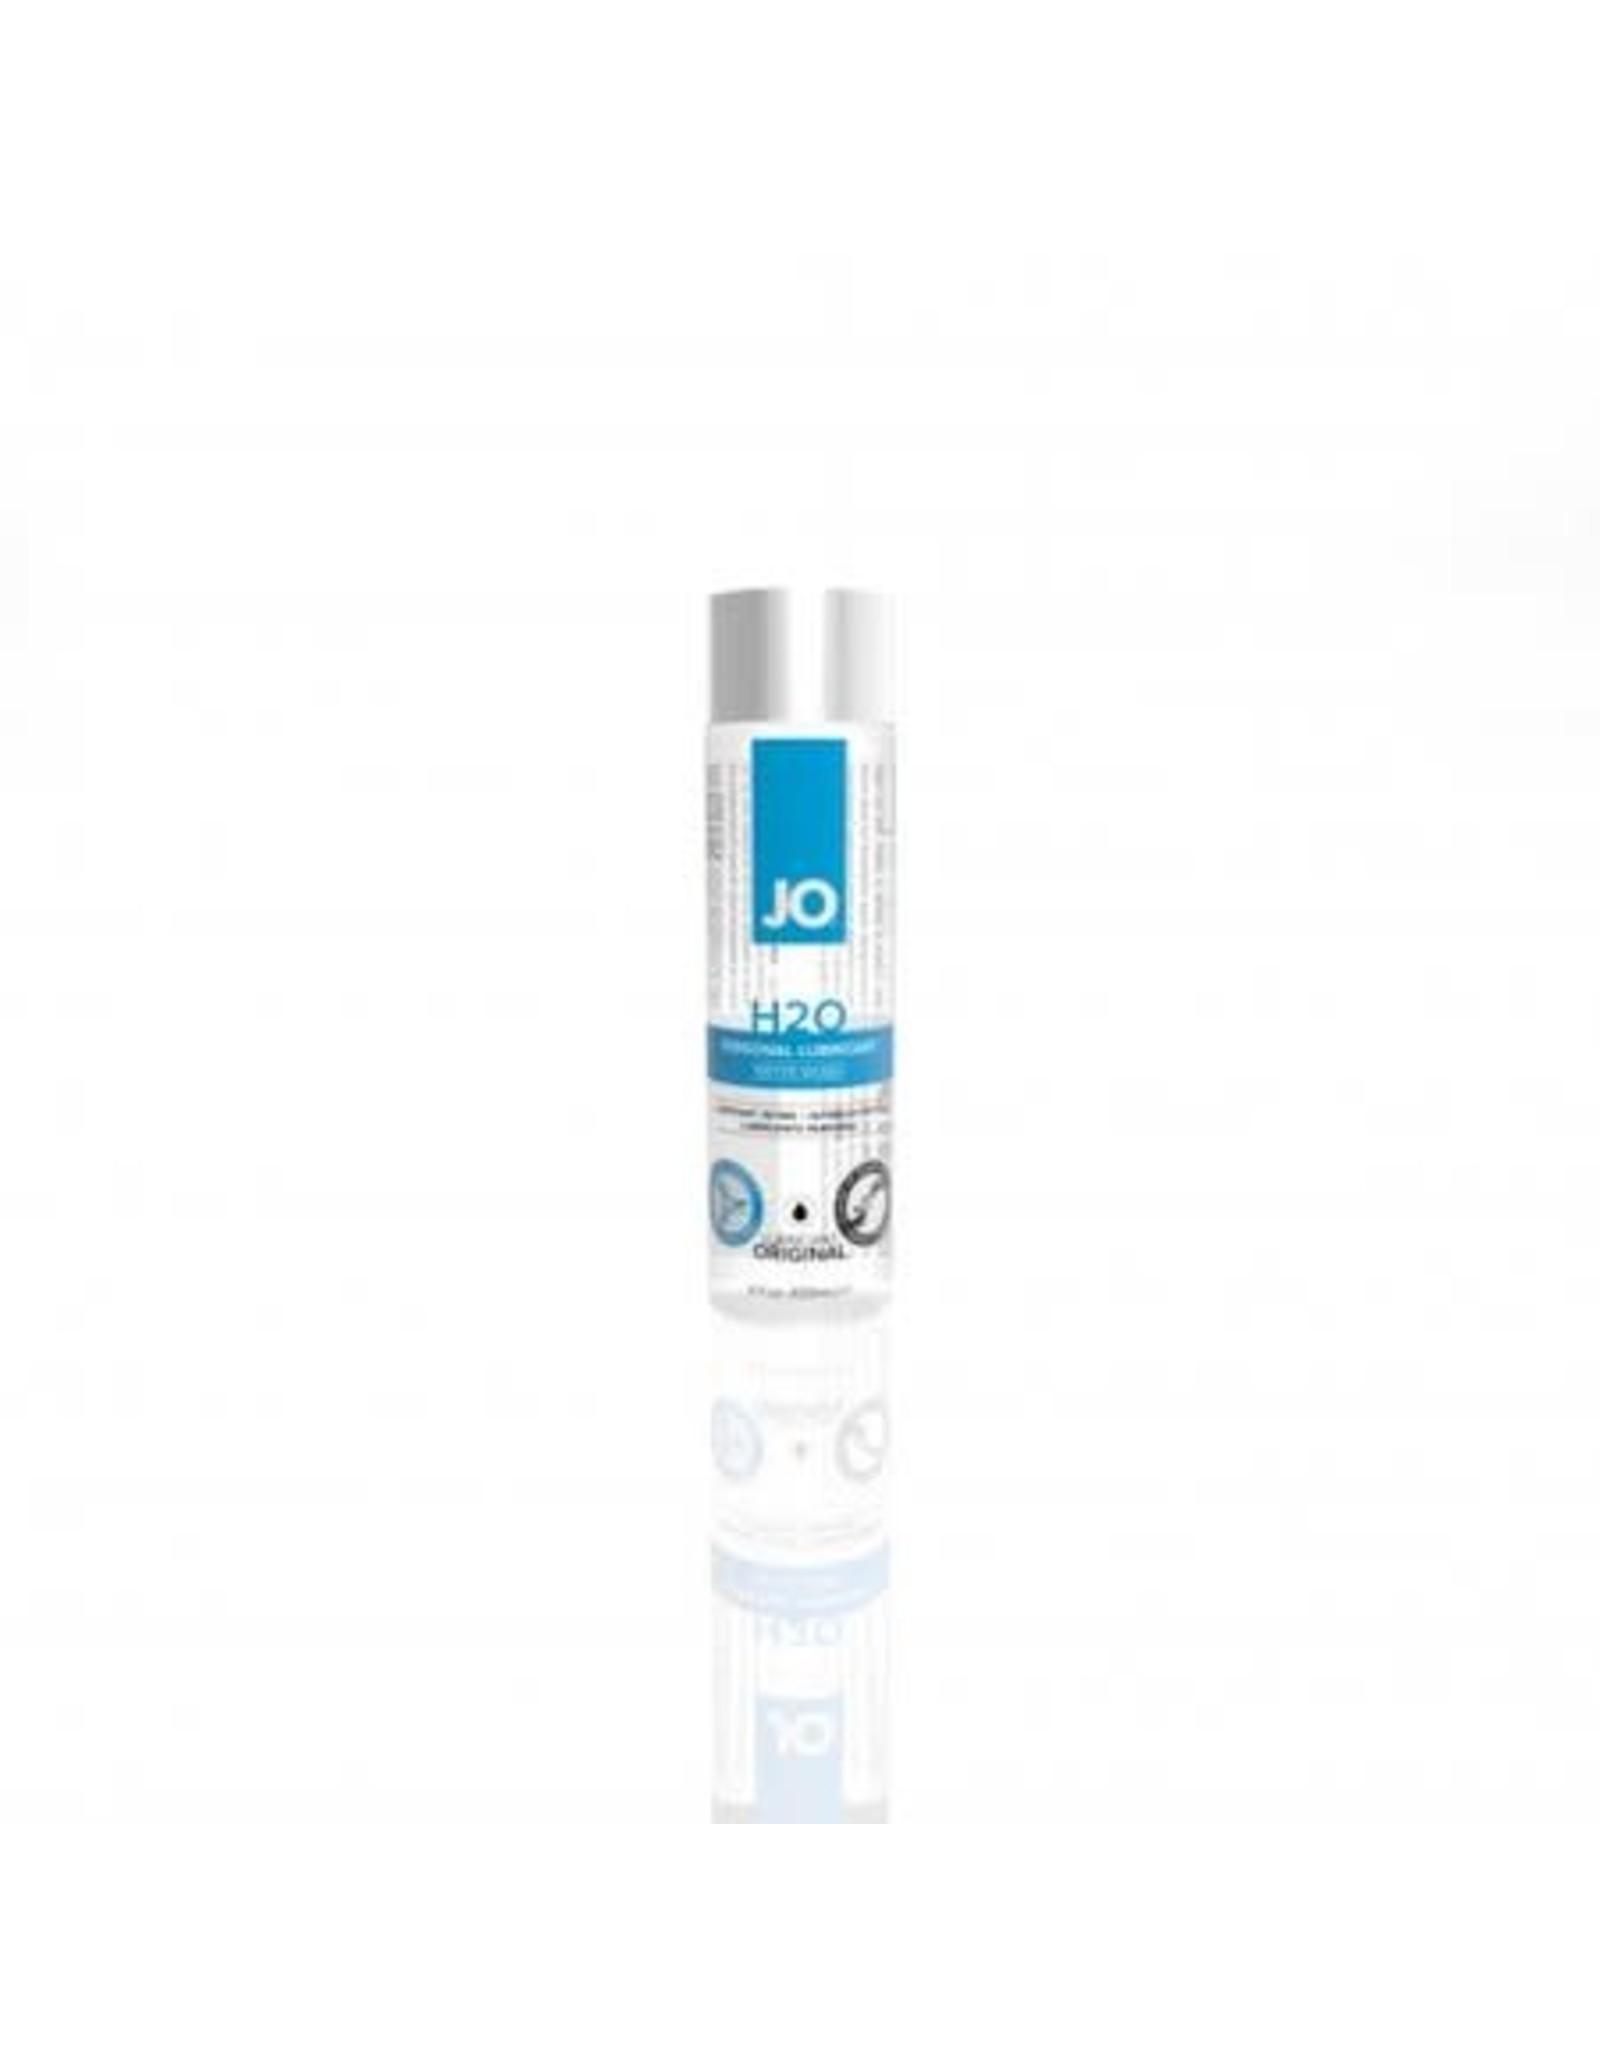 JO - H2O - 4 oz